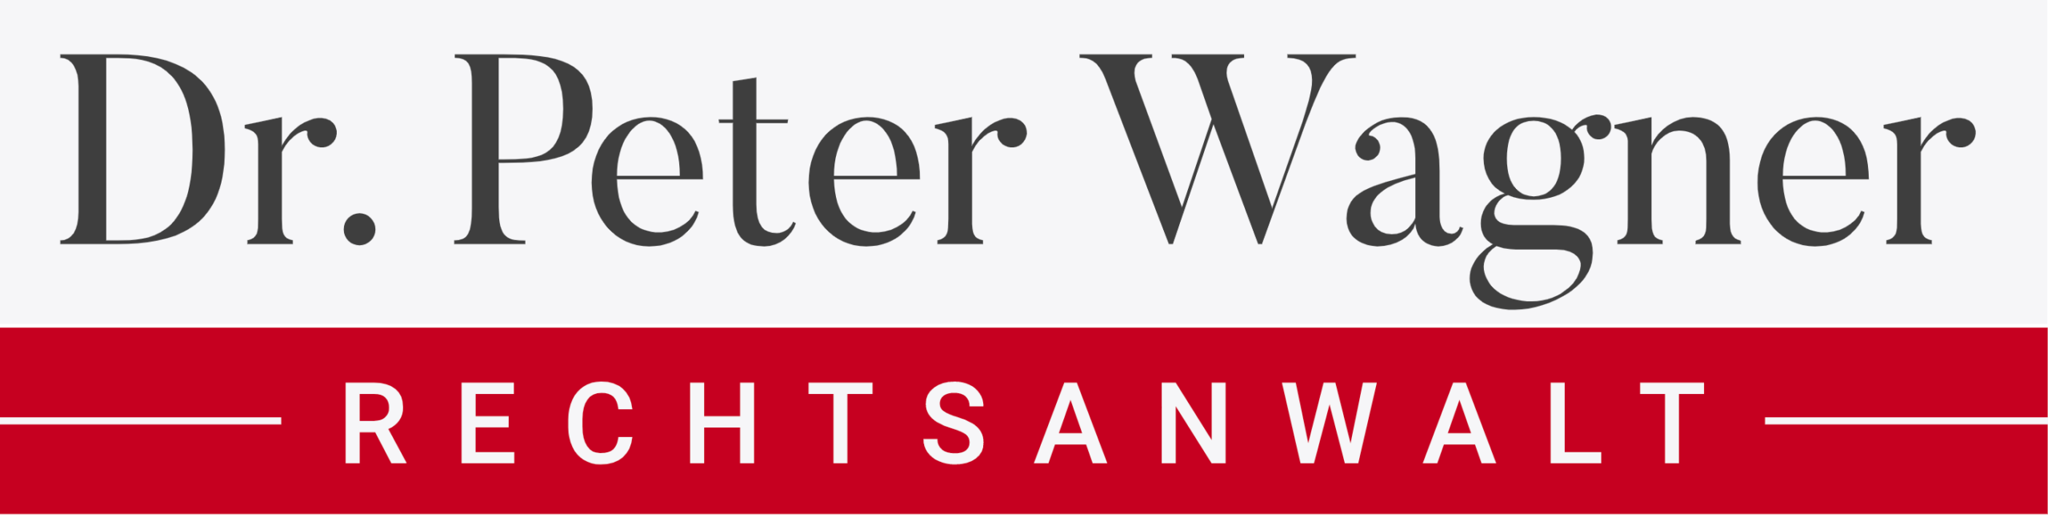 Rechtsanwalt Dr. Peter Wagner Logo